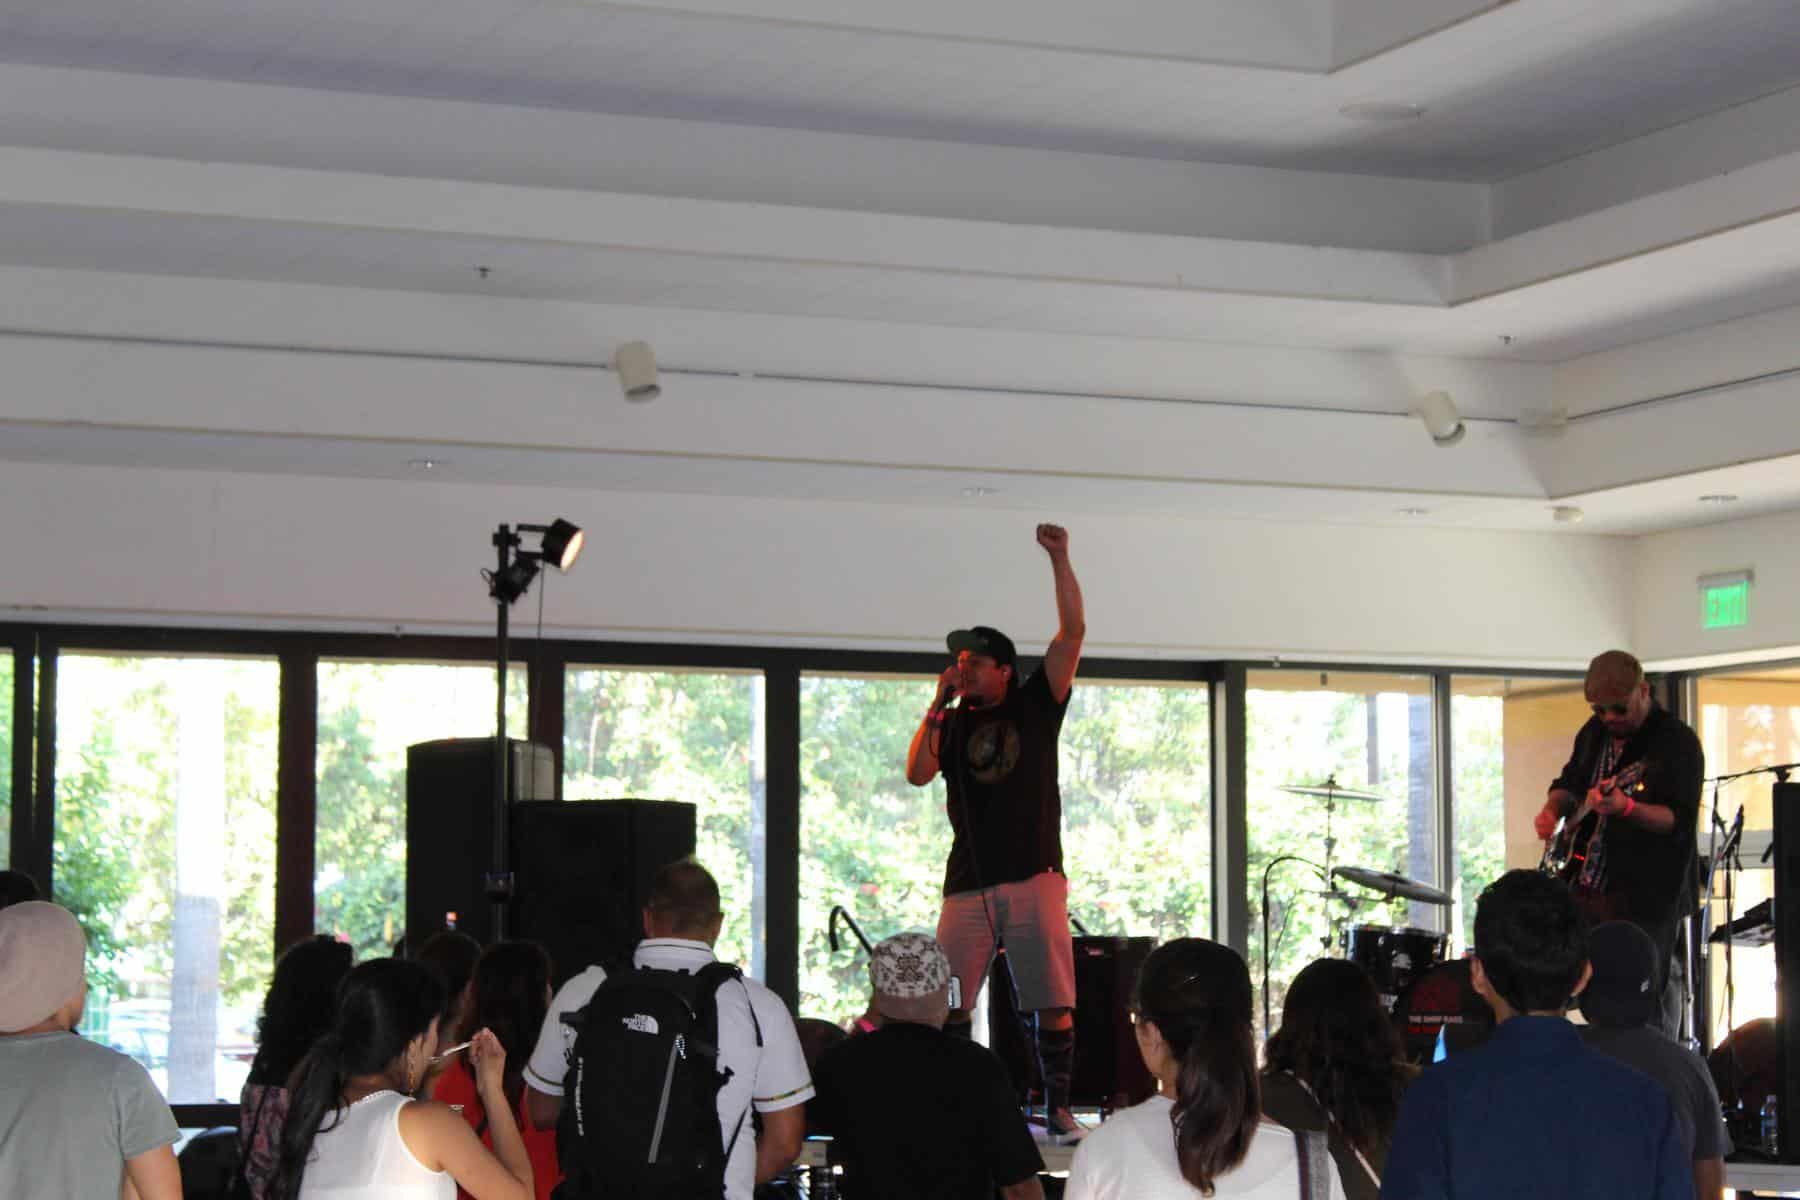 Vocalist raising fist in the air